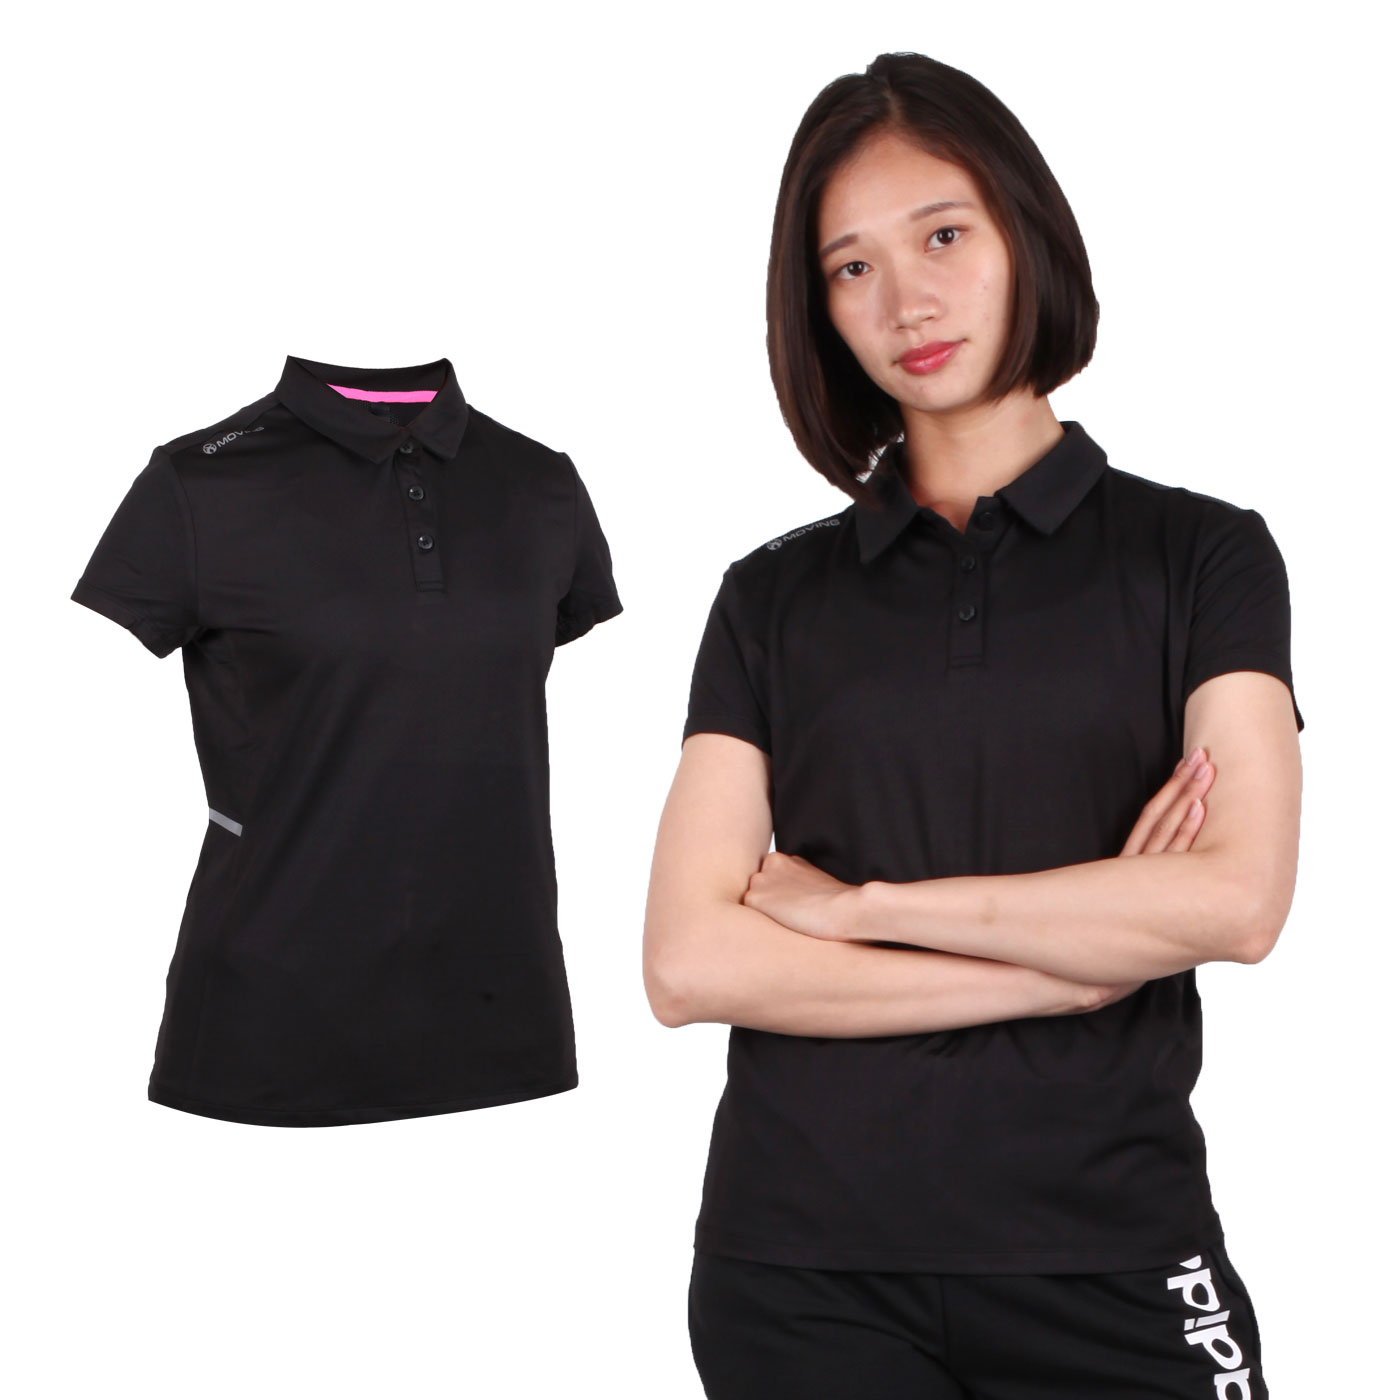 FIRESTAR 女款彈性短袖POLO衫 DL967-10